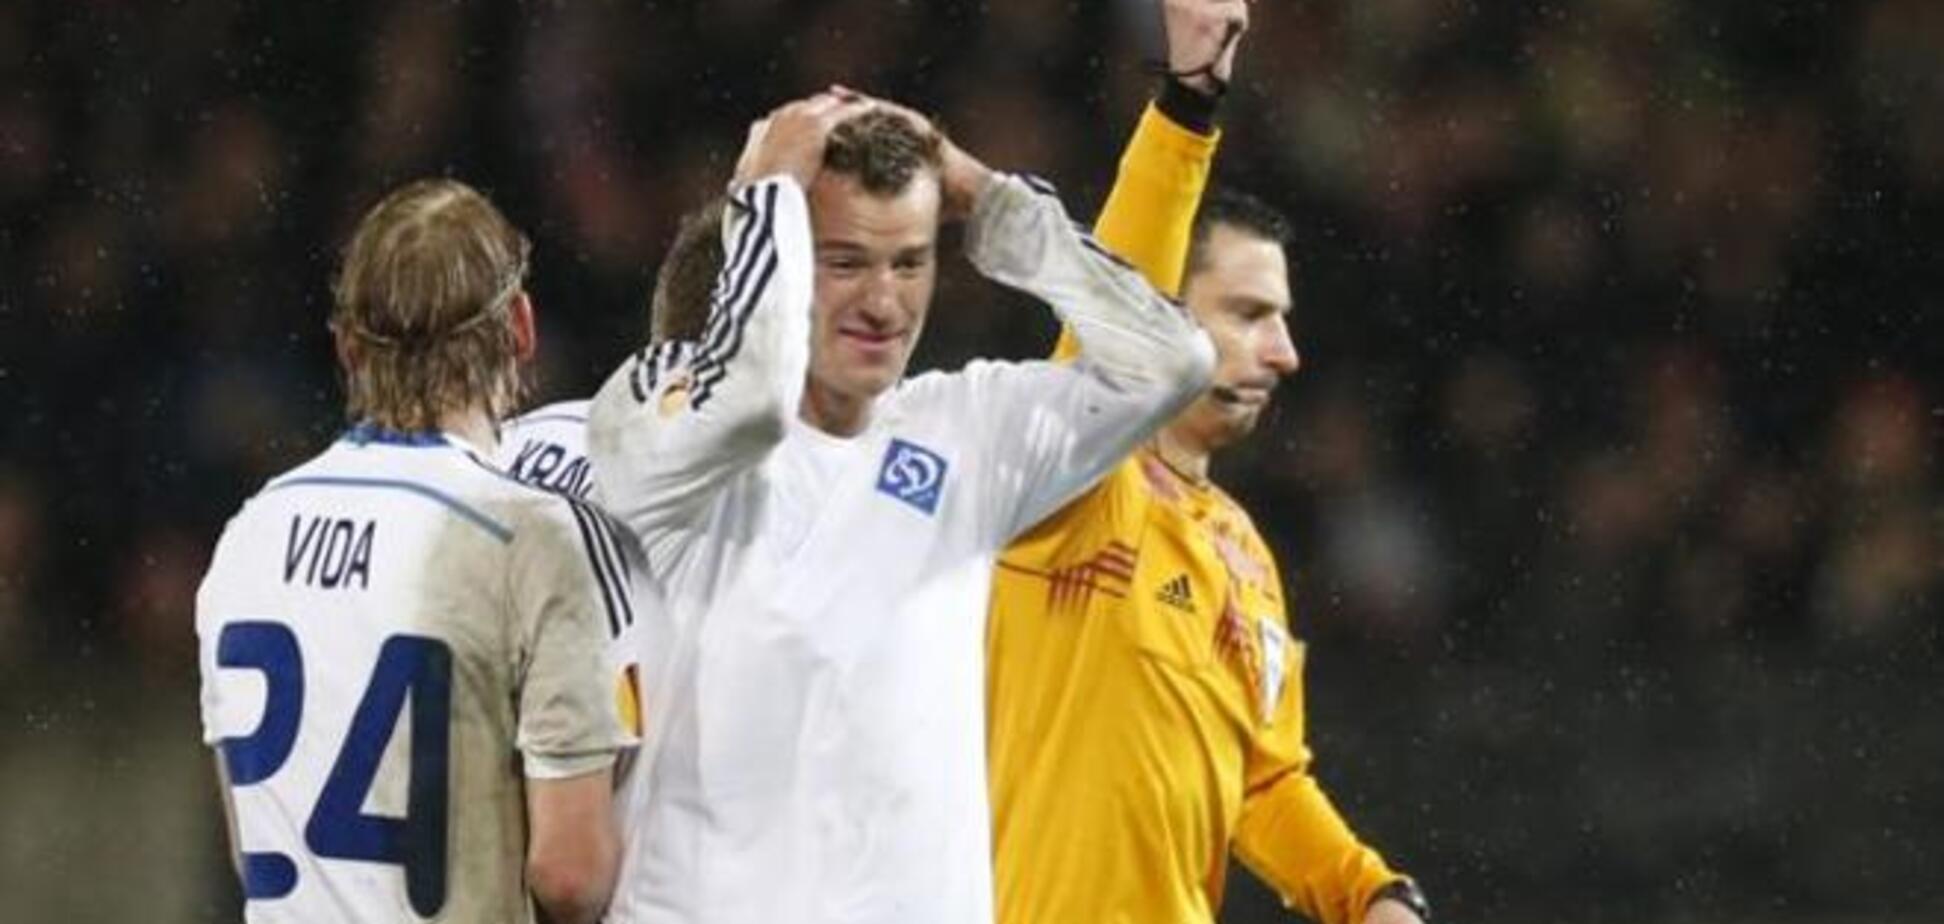 Український коментатор назвав суддю матчу Генгам - Динамо чистим 'тридваразом'